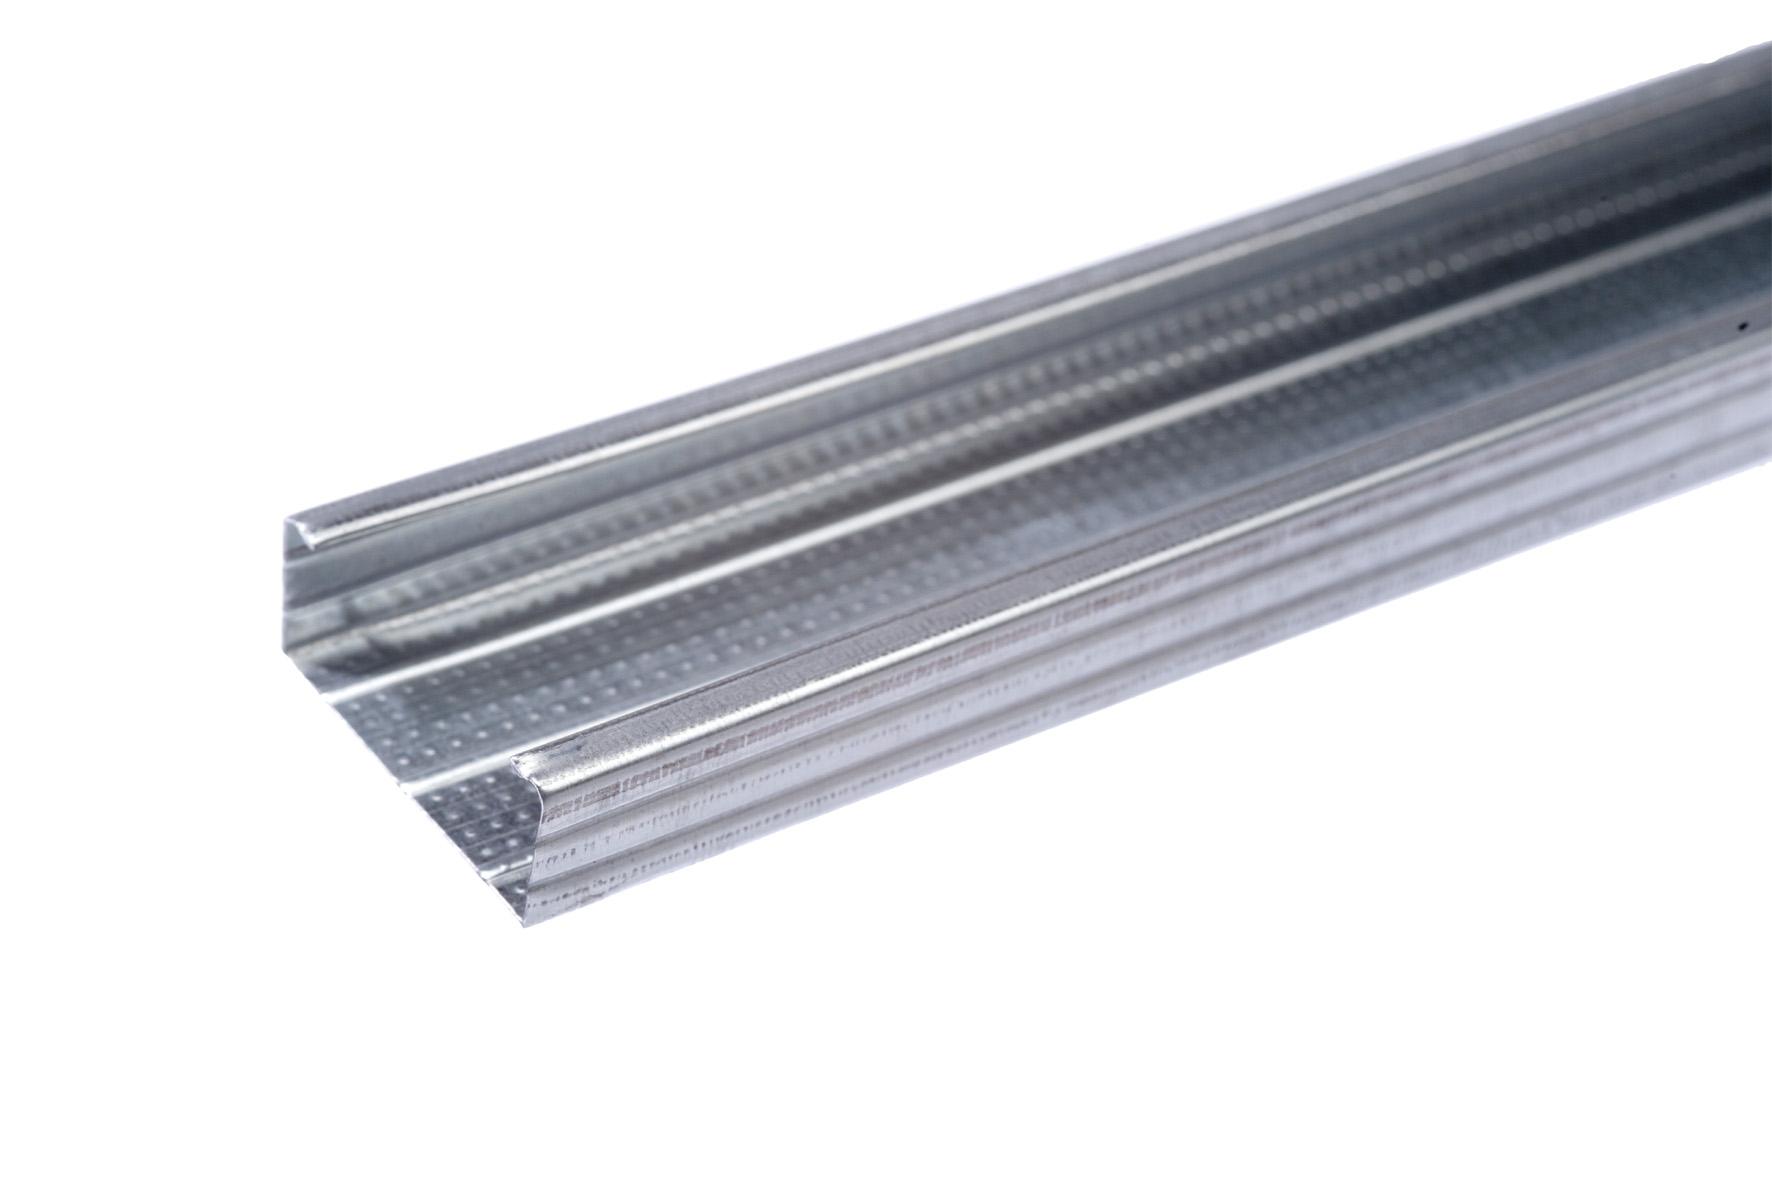 Bgl1 Metal Stud Wall Liner 3000mm